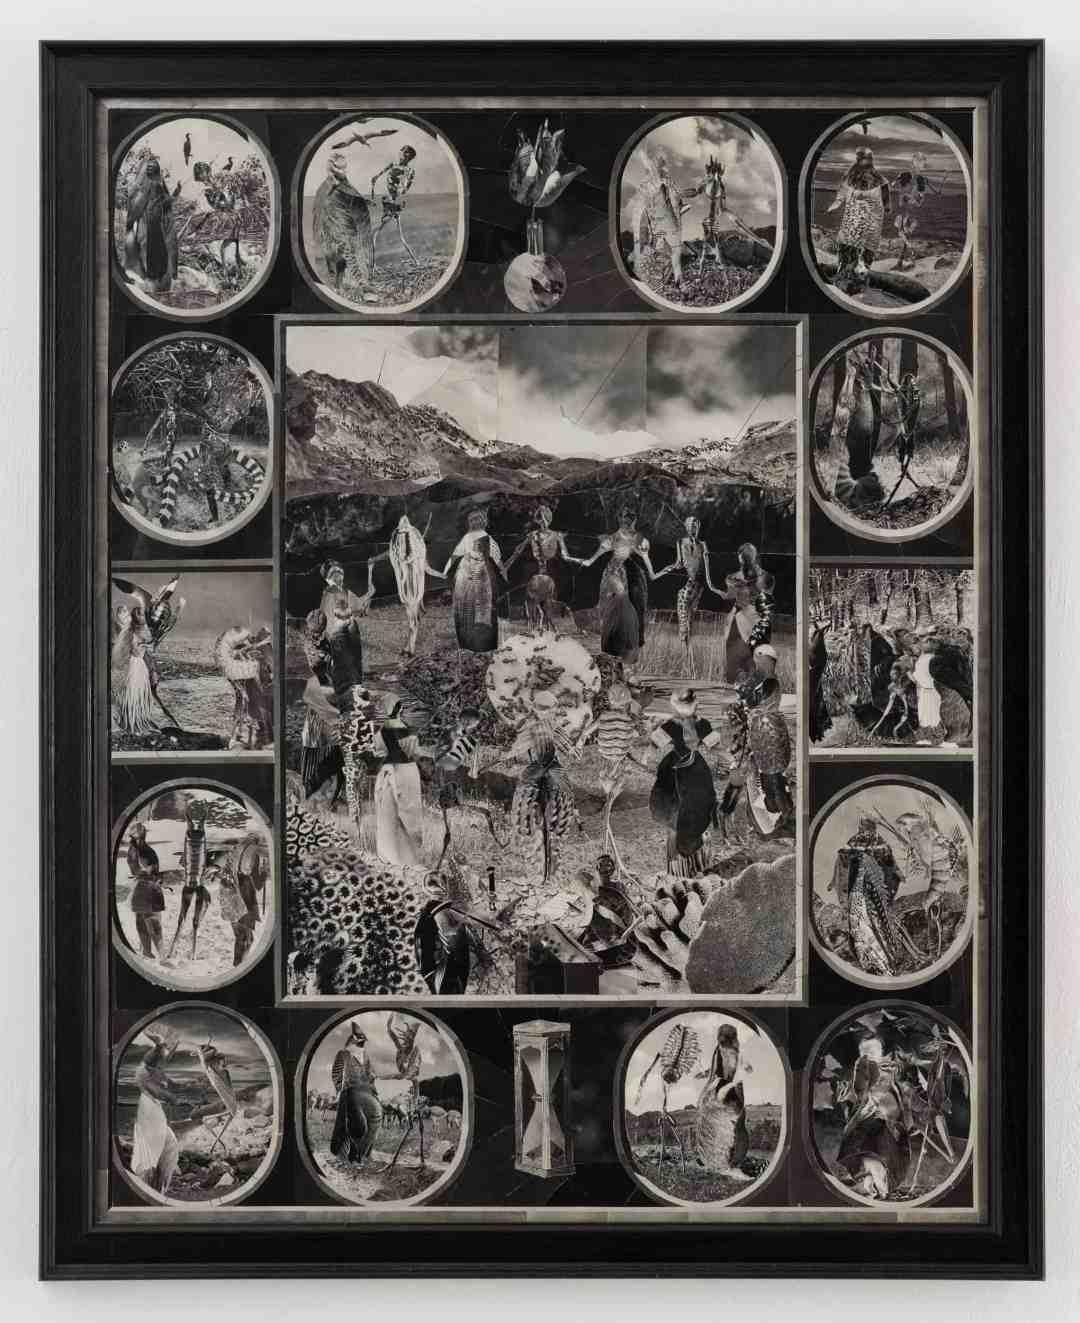 Wojciech Ireneusz Sobczak, Danse Macabre, 2018, collage, photo: B. Górka